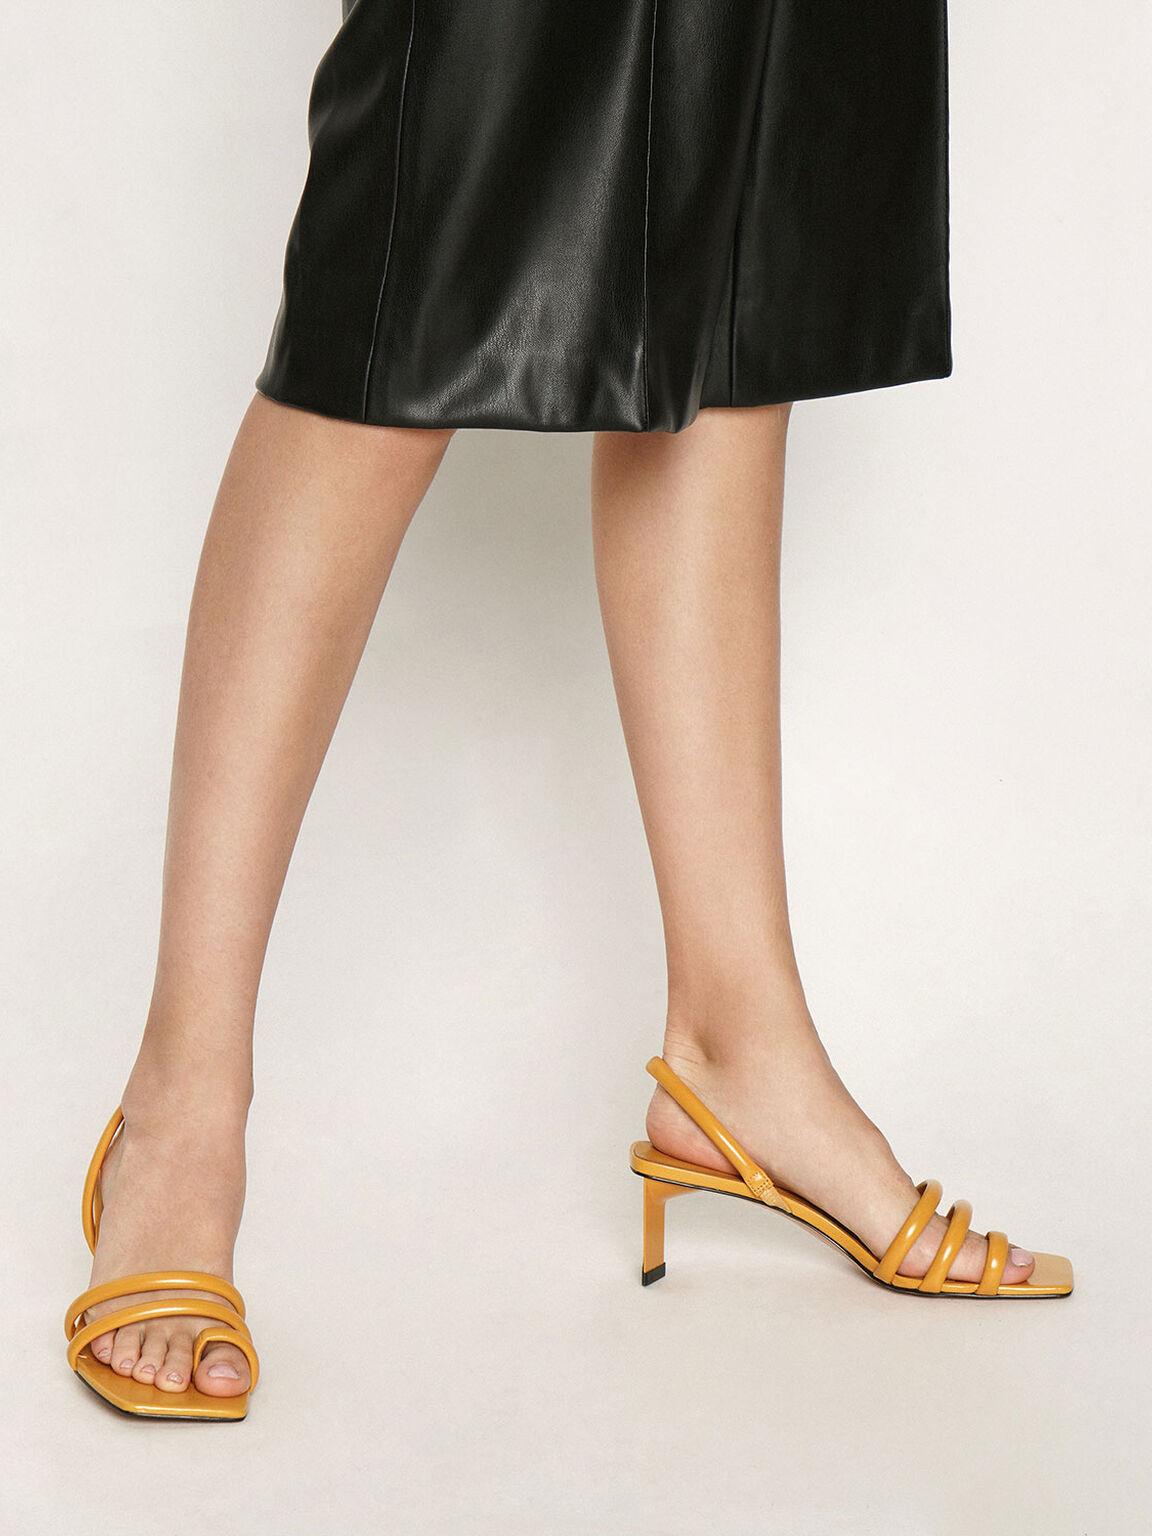 Toe Loop Strappy Slingback Heels, Yellow, hi-res